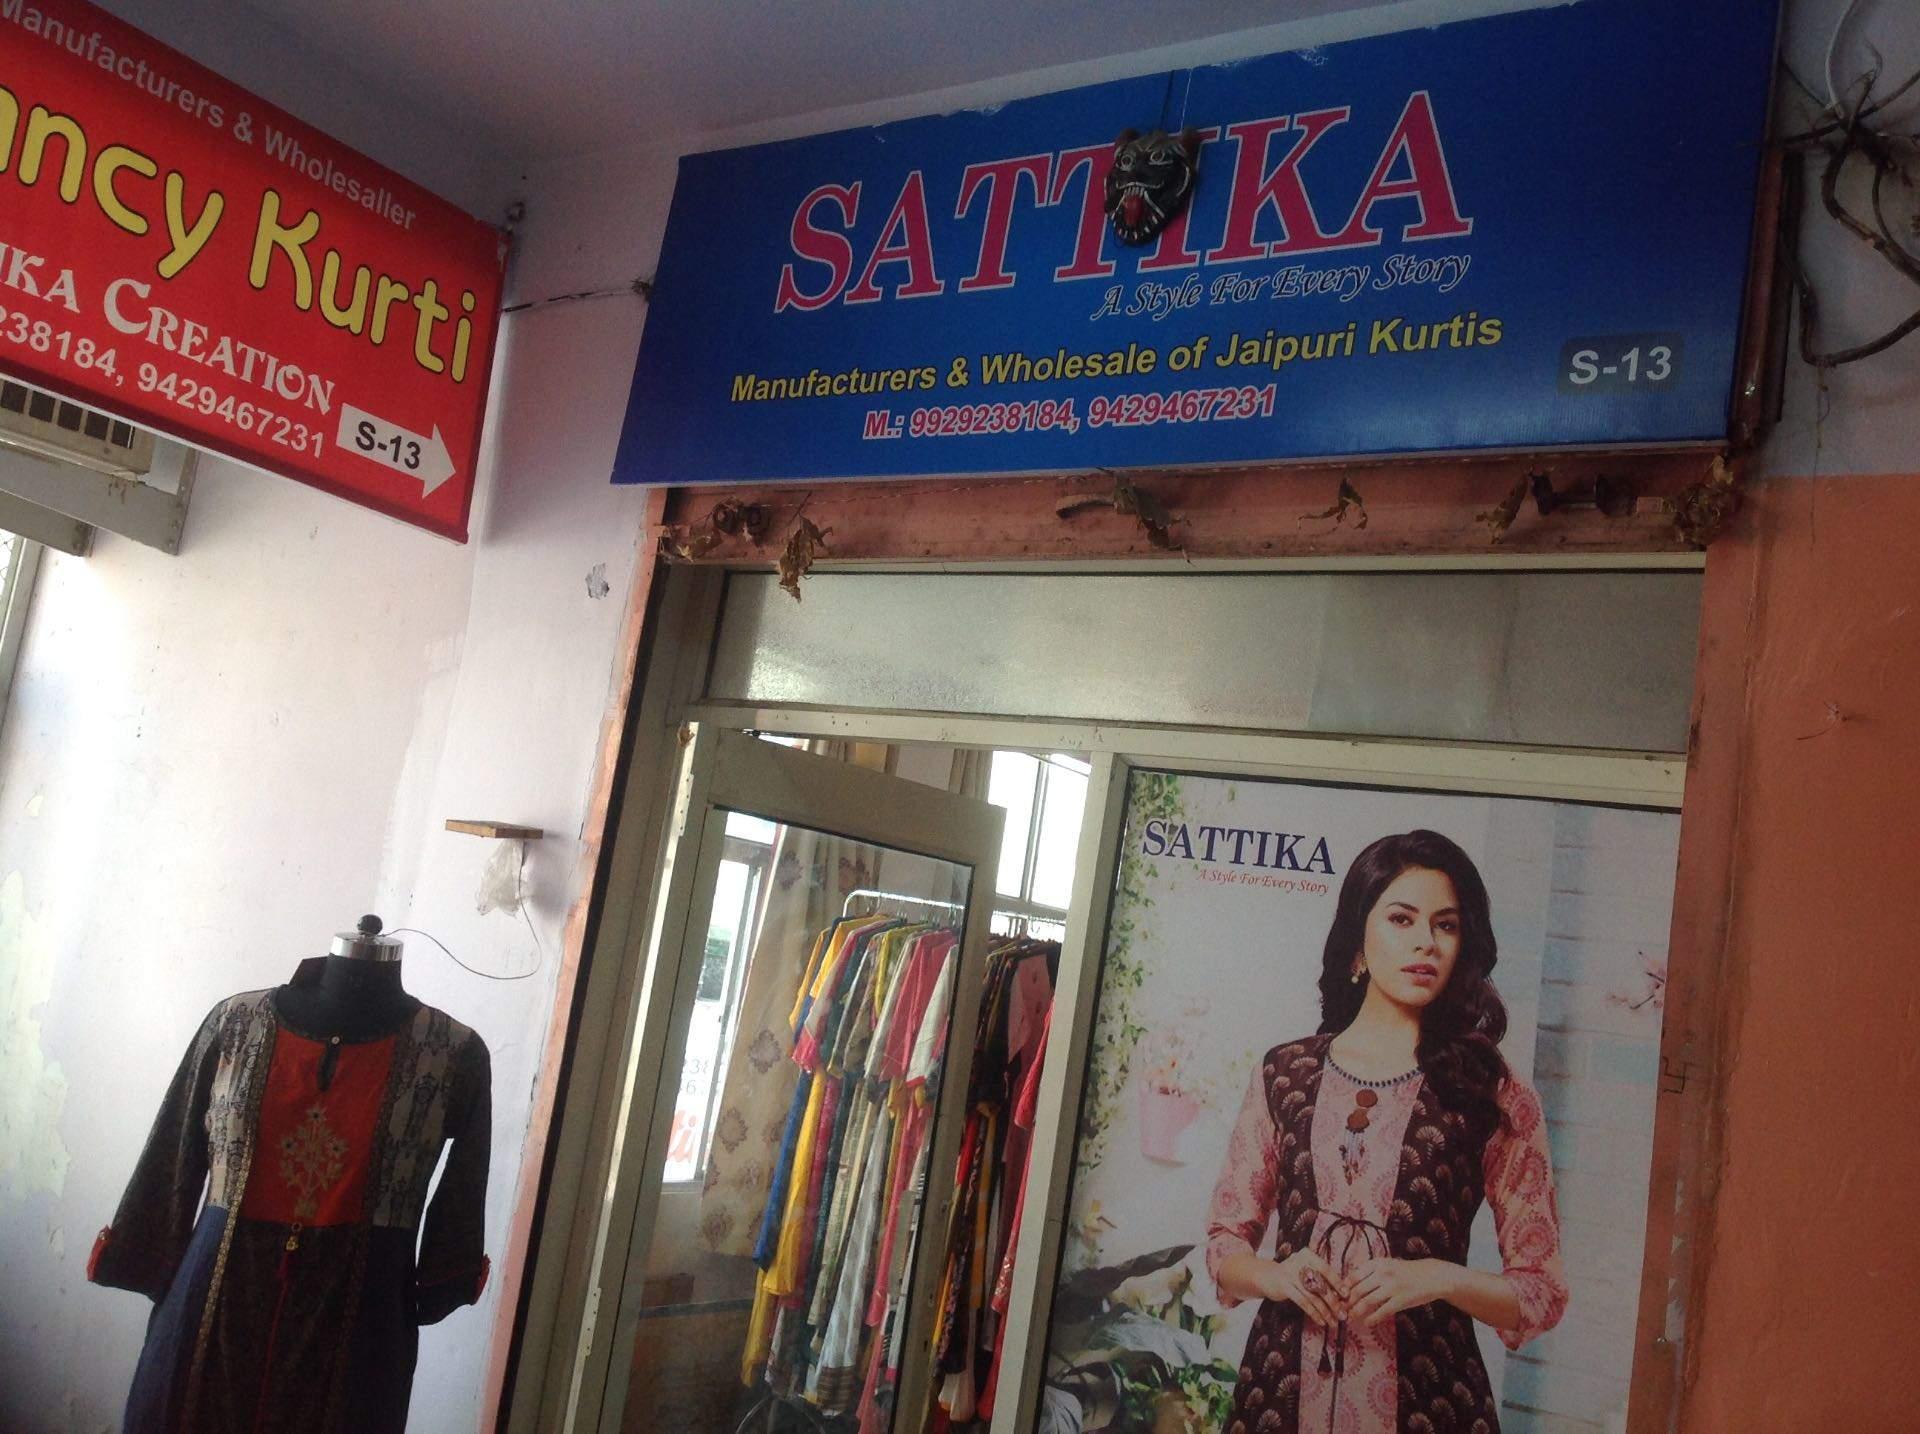 8214ccc1be Top 100 Women Kurti Wholesalers in Jaipur - Best Ladies Kurti Wholesalers -  Justdial